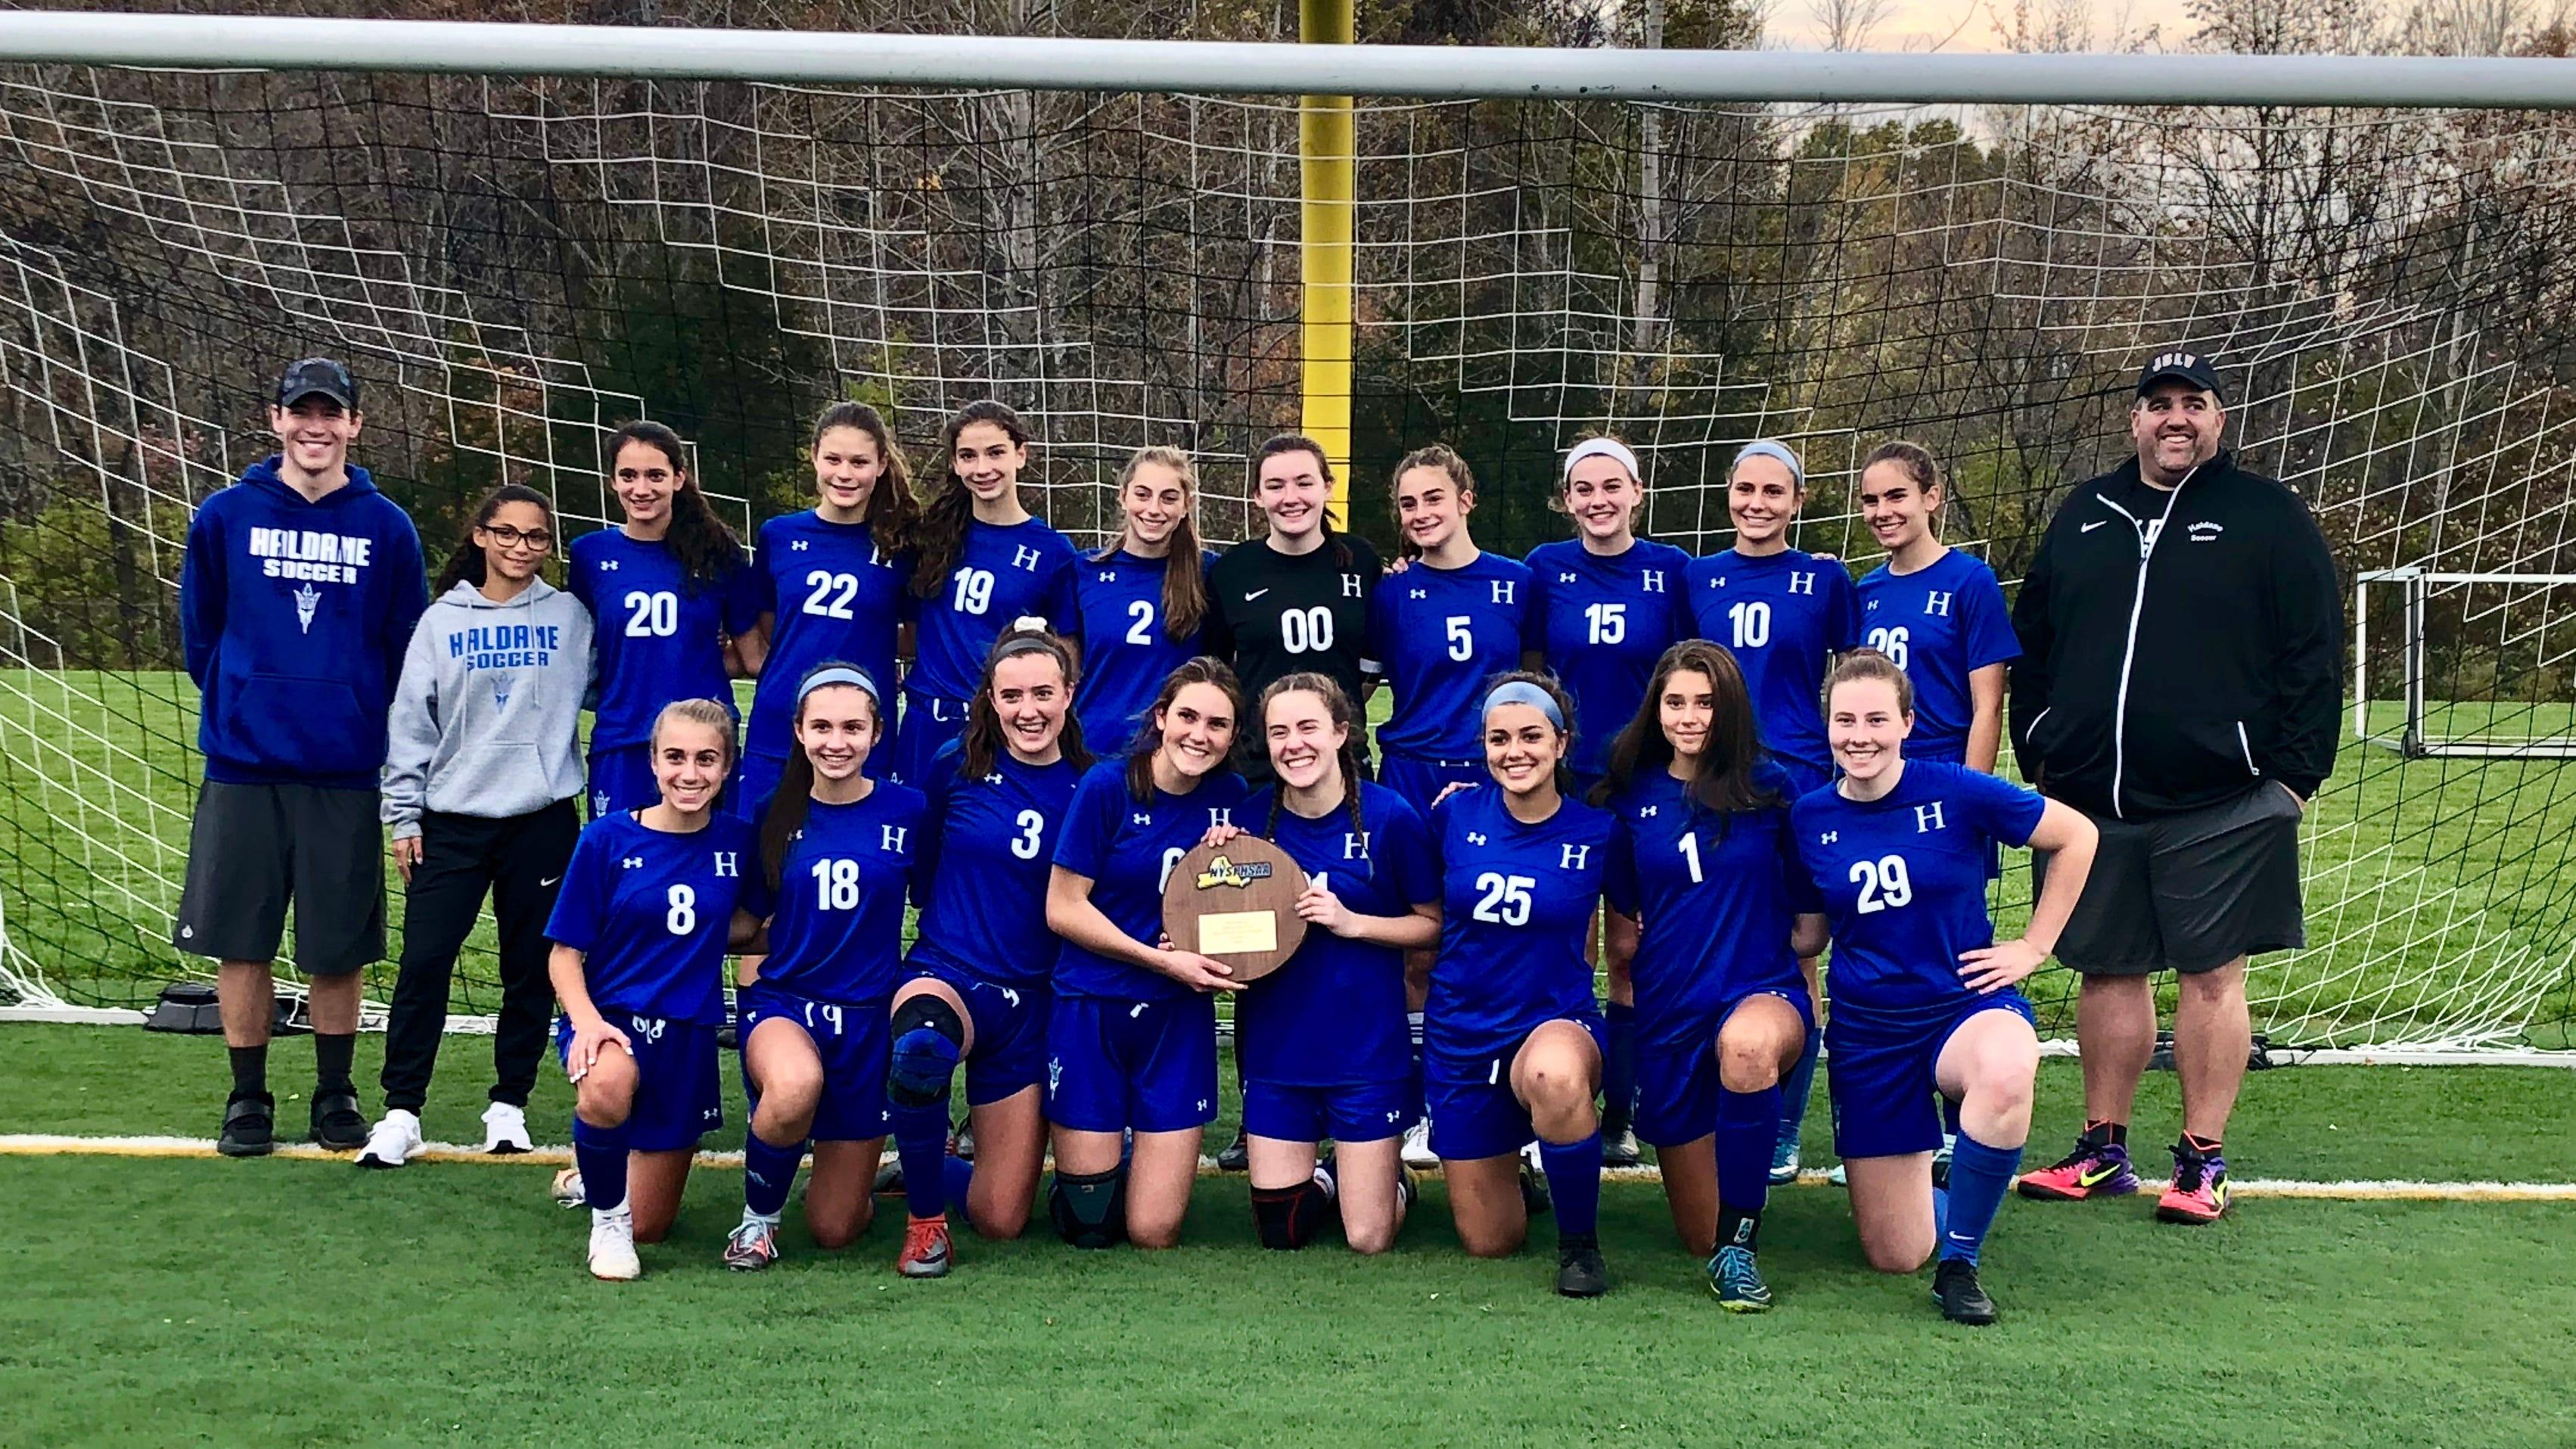 The Haldane girls soccer team poses after winning the Class C regional title on Oct. 31.